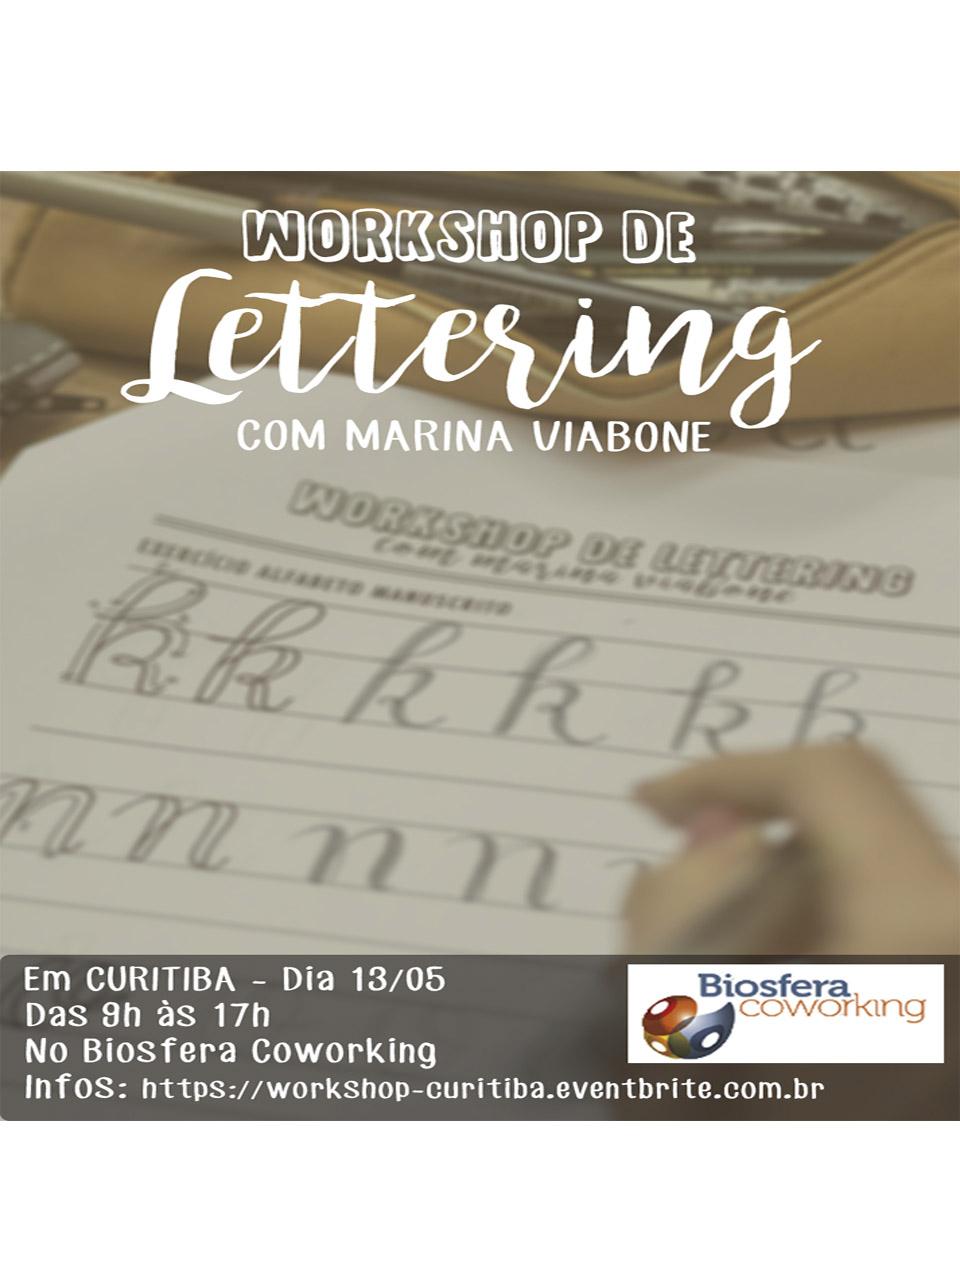 Workshop Biosfera Coworking Curitiba Lettering